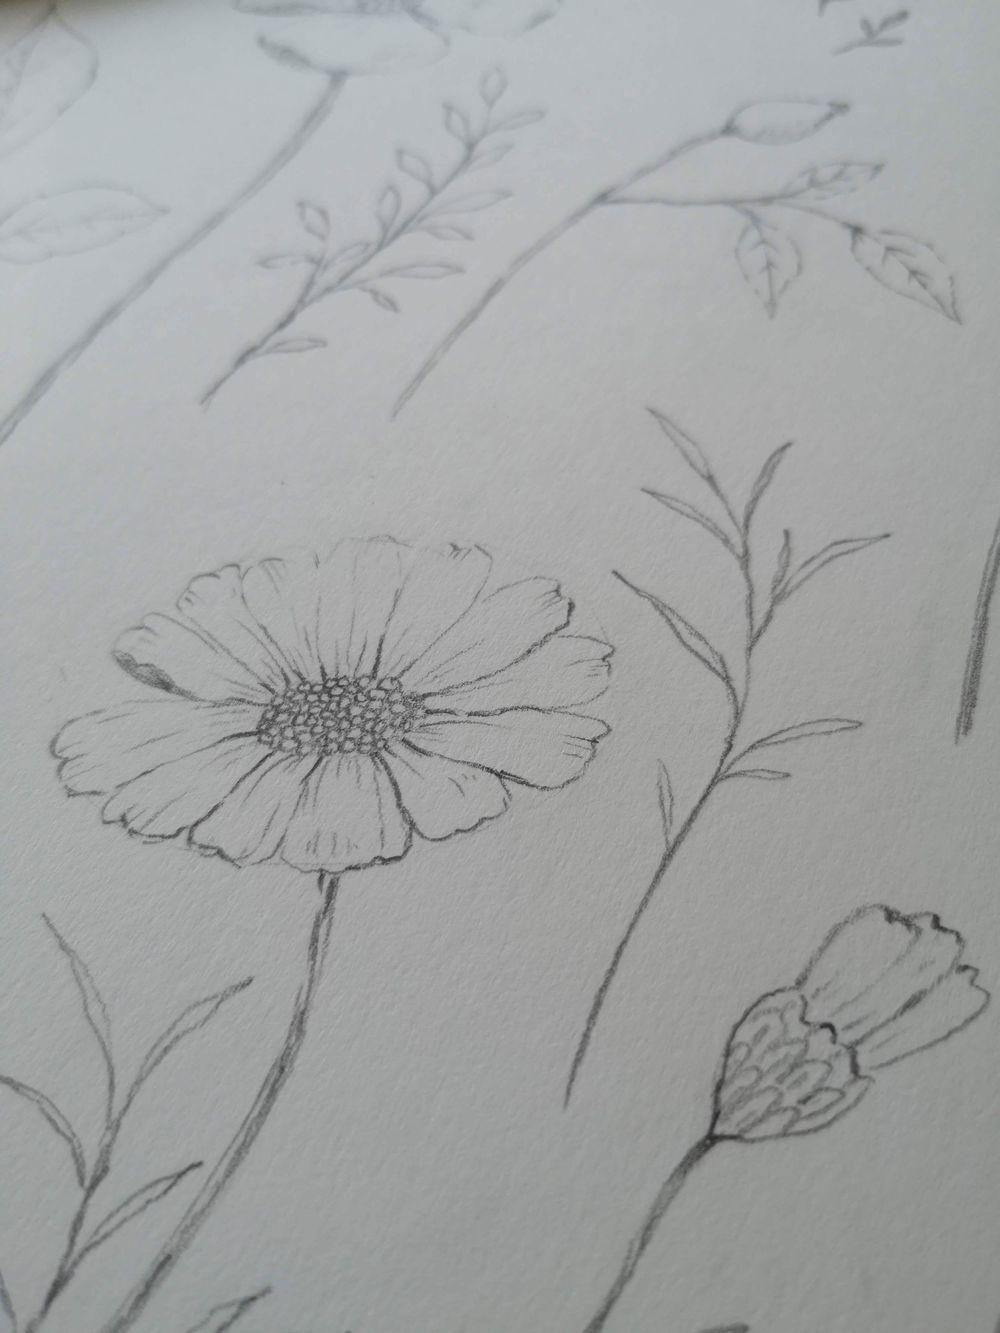 Pencil sketch botanicals - image 2 - student project